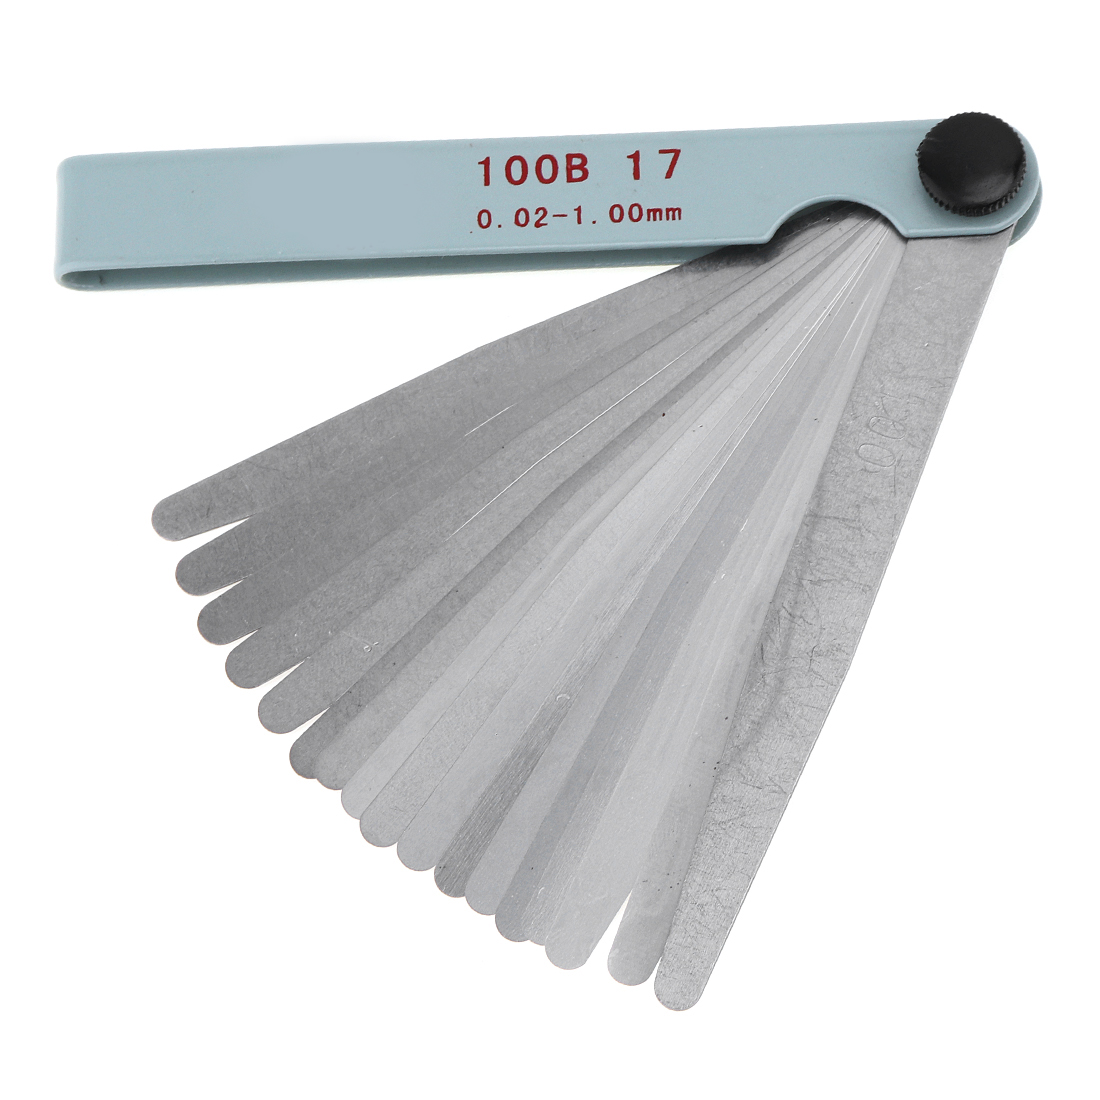 Feeler Gauge 100B 17 Blade Stainless Steel With Adjustable Nut And 0.02 - 1.00mm Measuring Range Measuring Tools